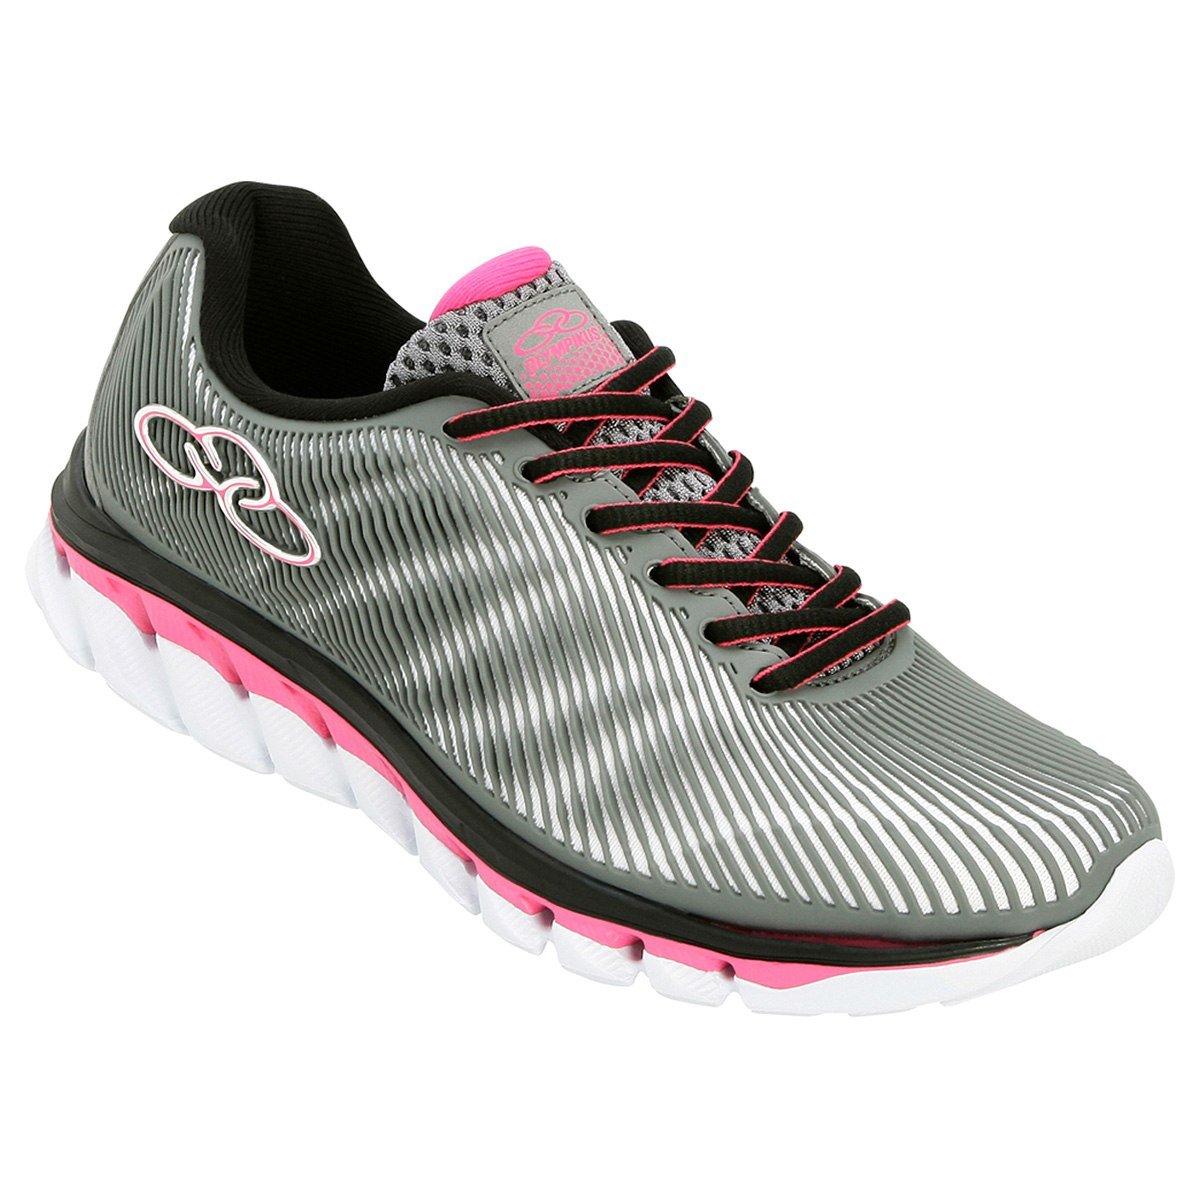 30aaa7bddb Tênis Olympikus Perfect Feminino Cinza Pink - Zuazen